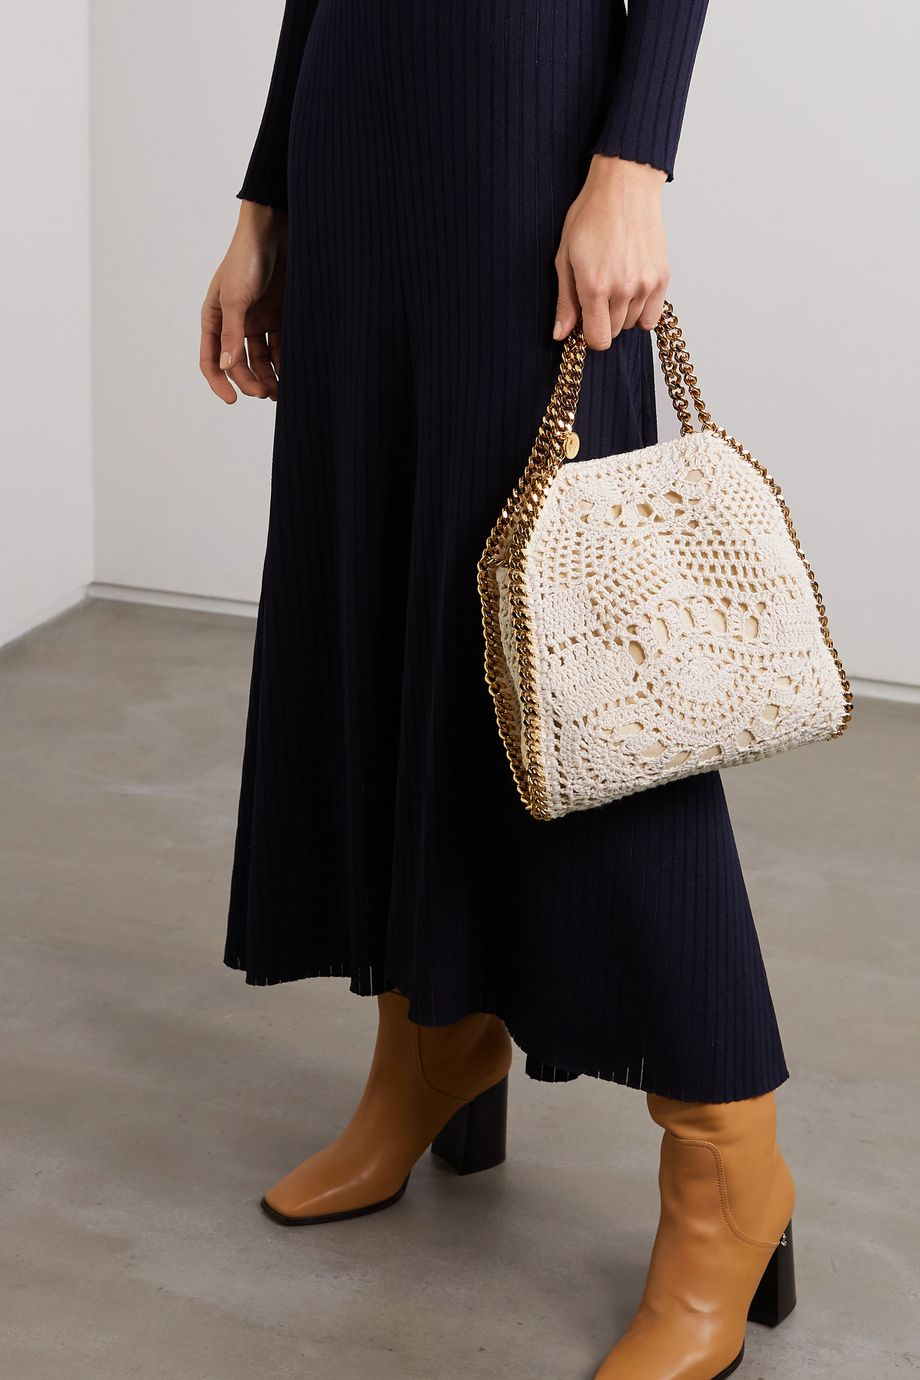 Stella McCartney The Falabella mini crocheted cotton shoulder bag